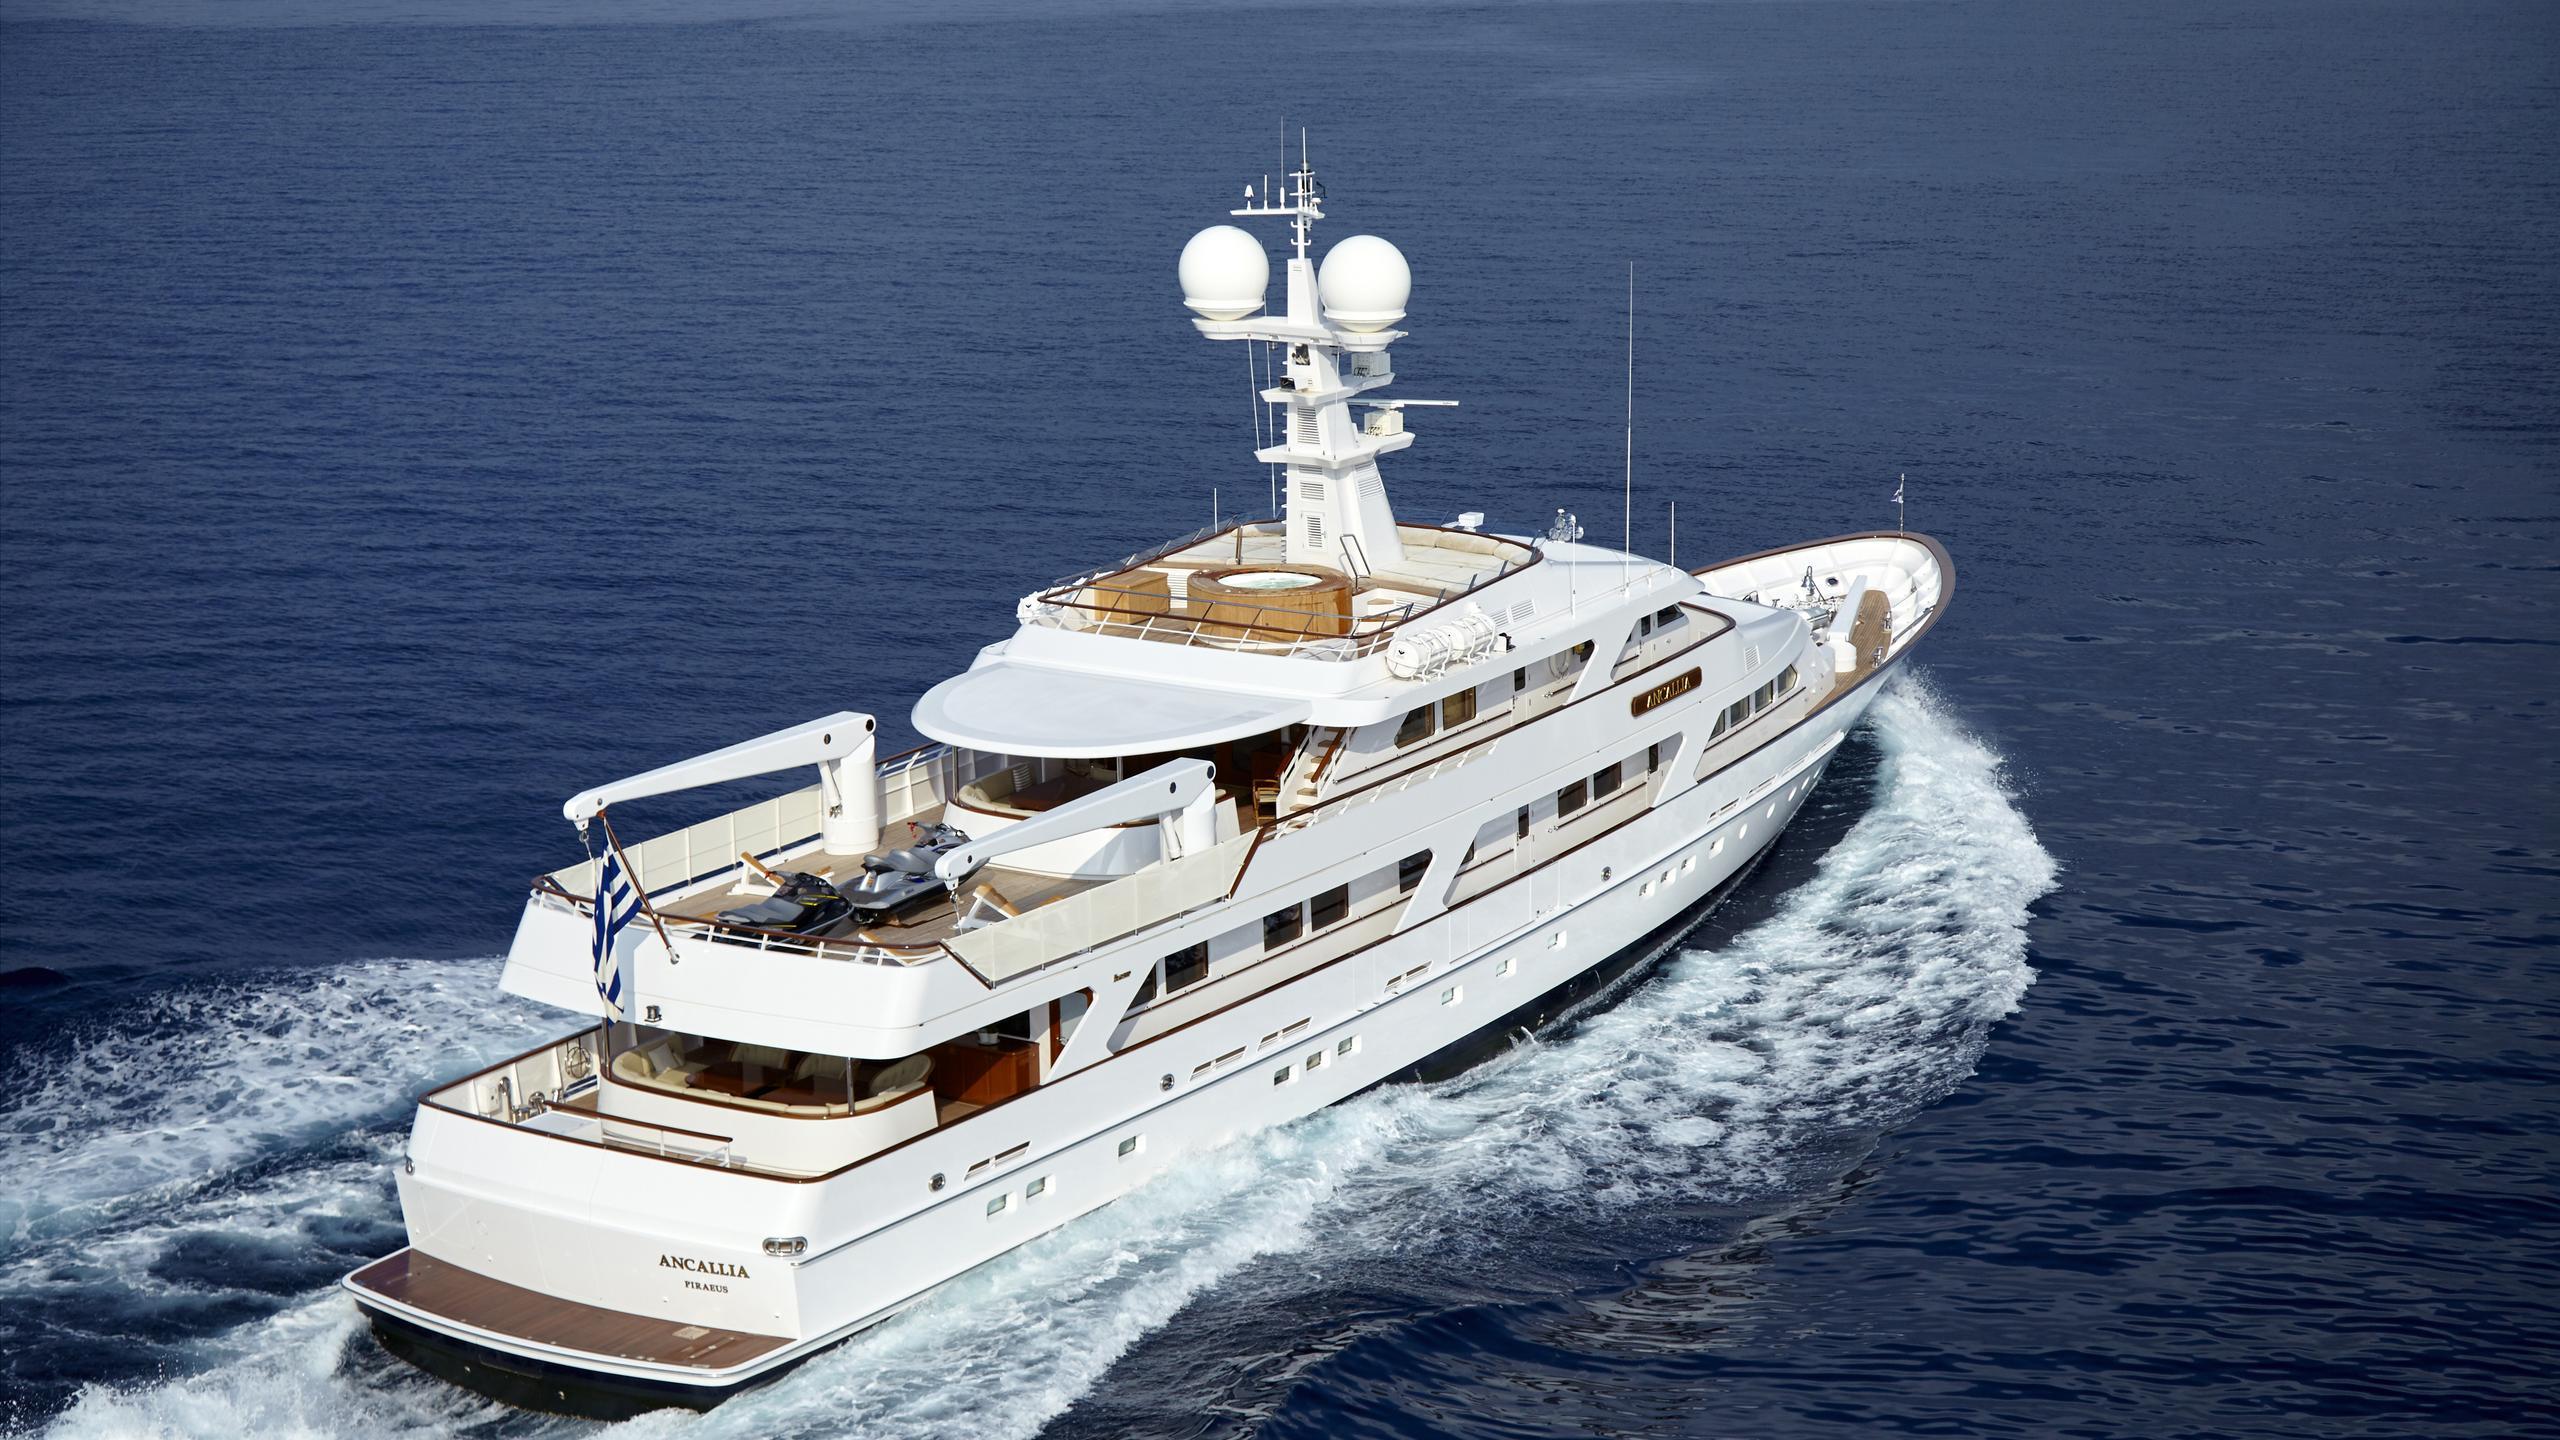 ancallia-yacht-cruising